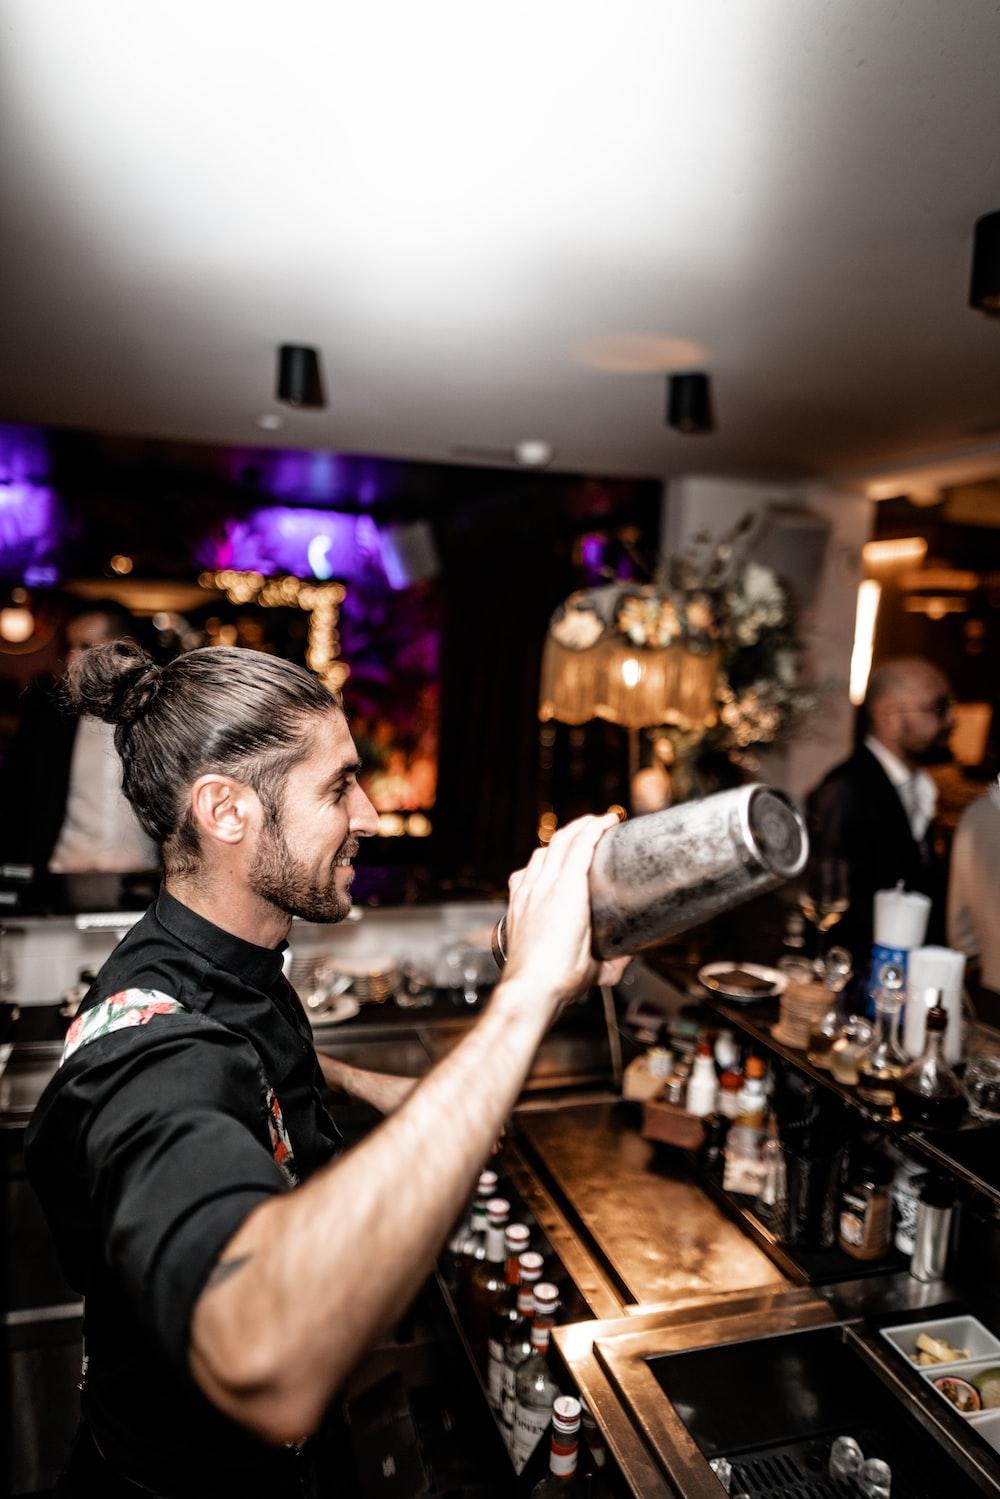 man holding bar shaker inside bar